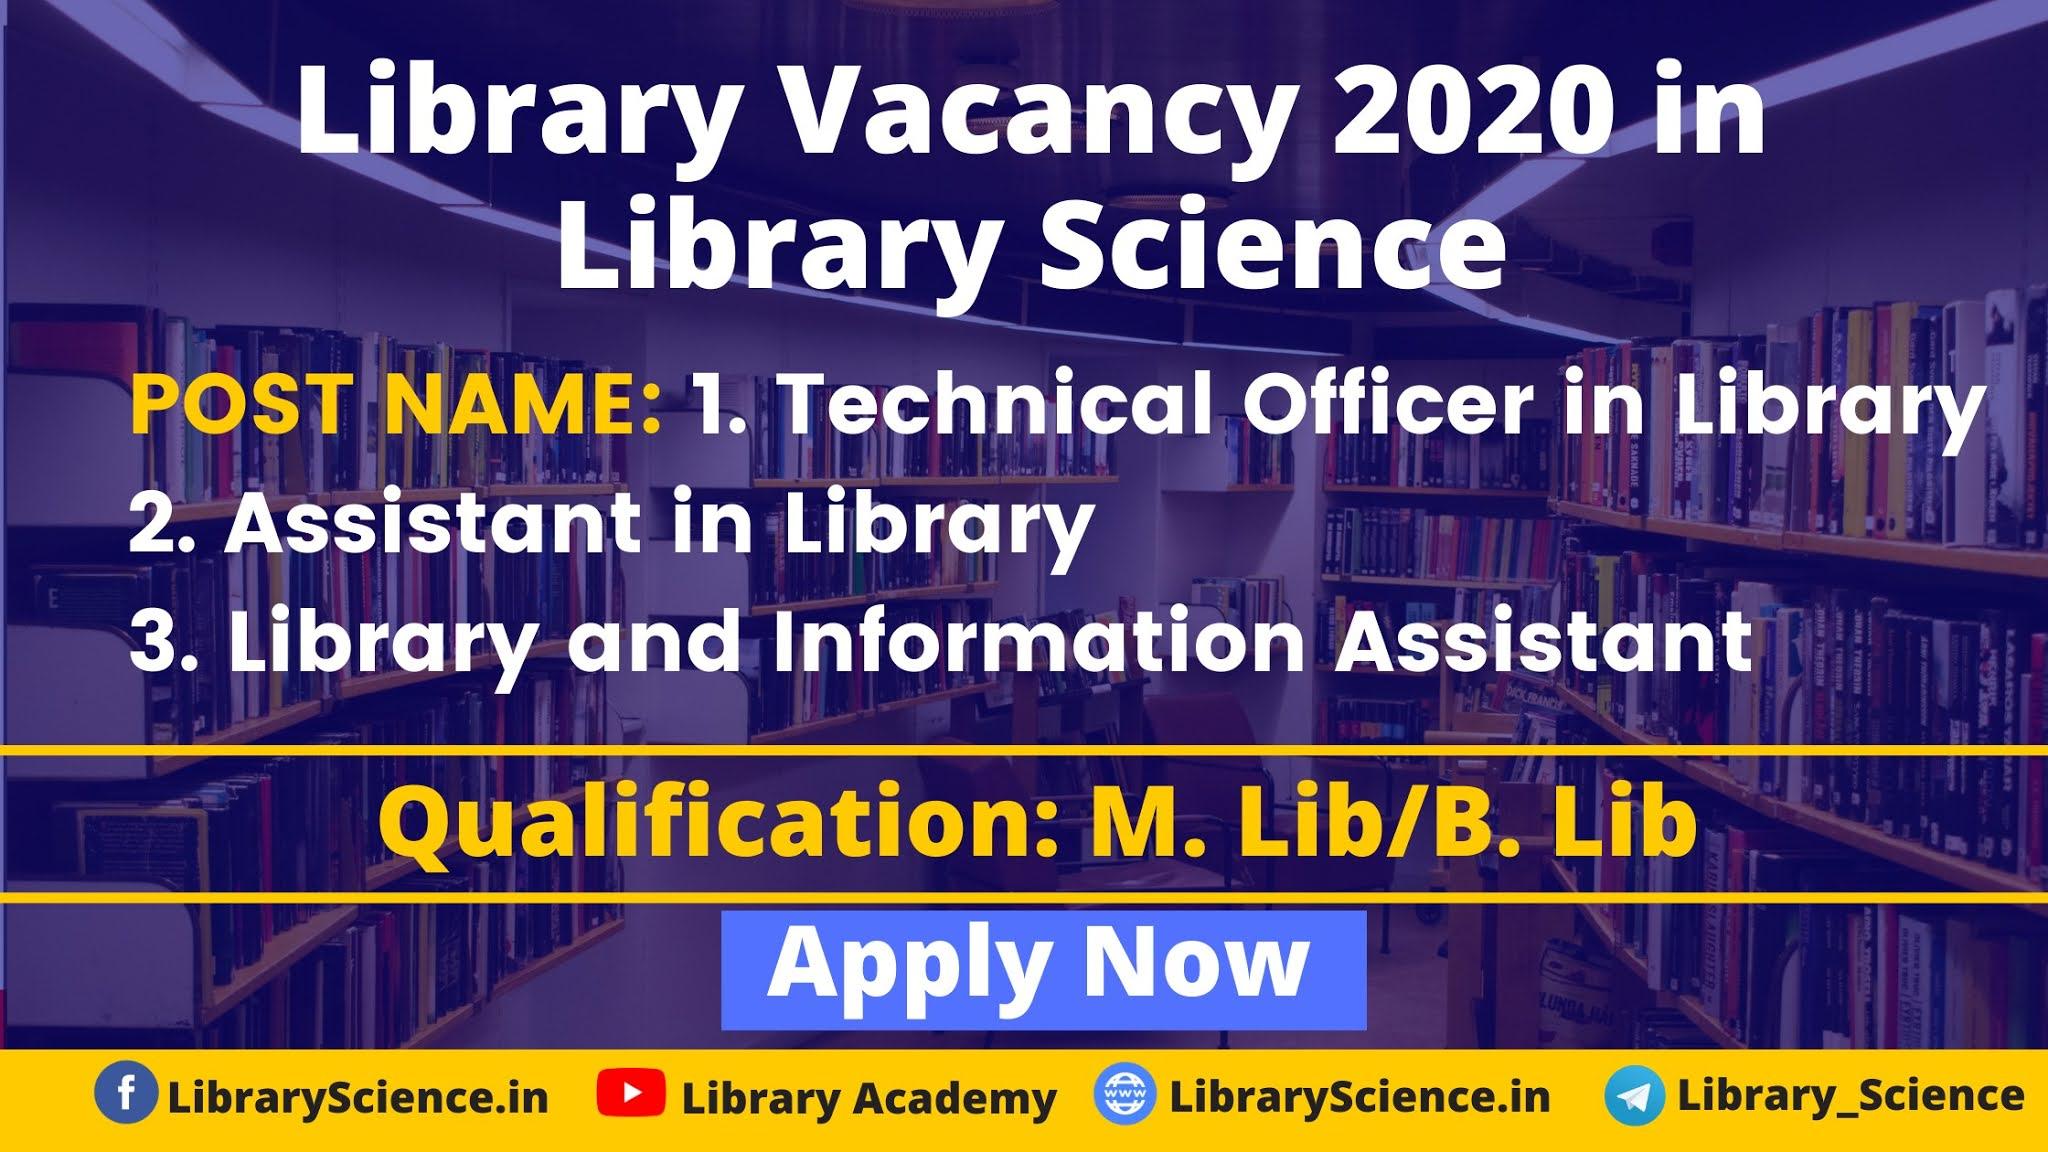 Library Vacancy 2020